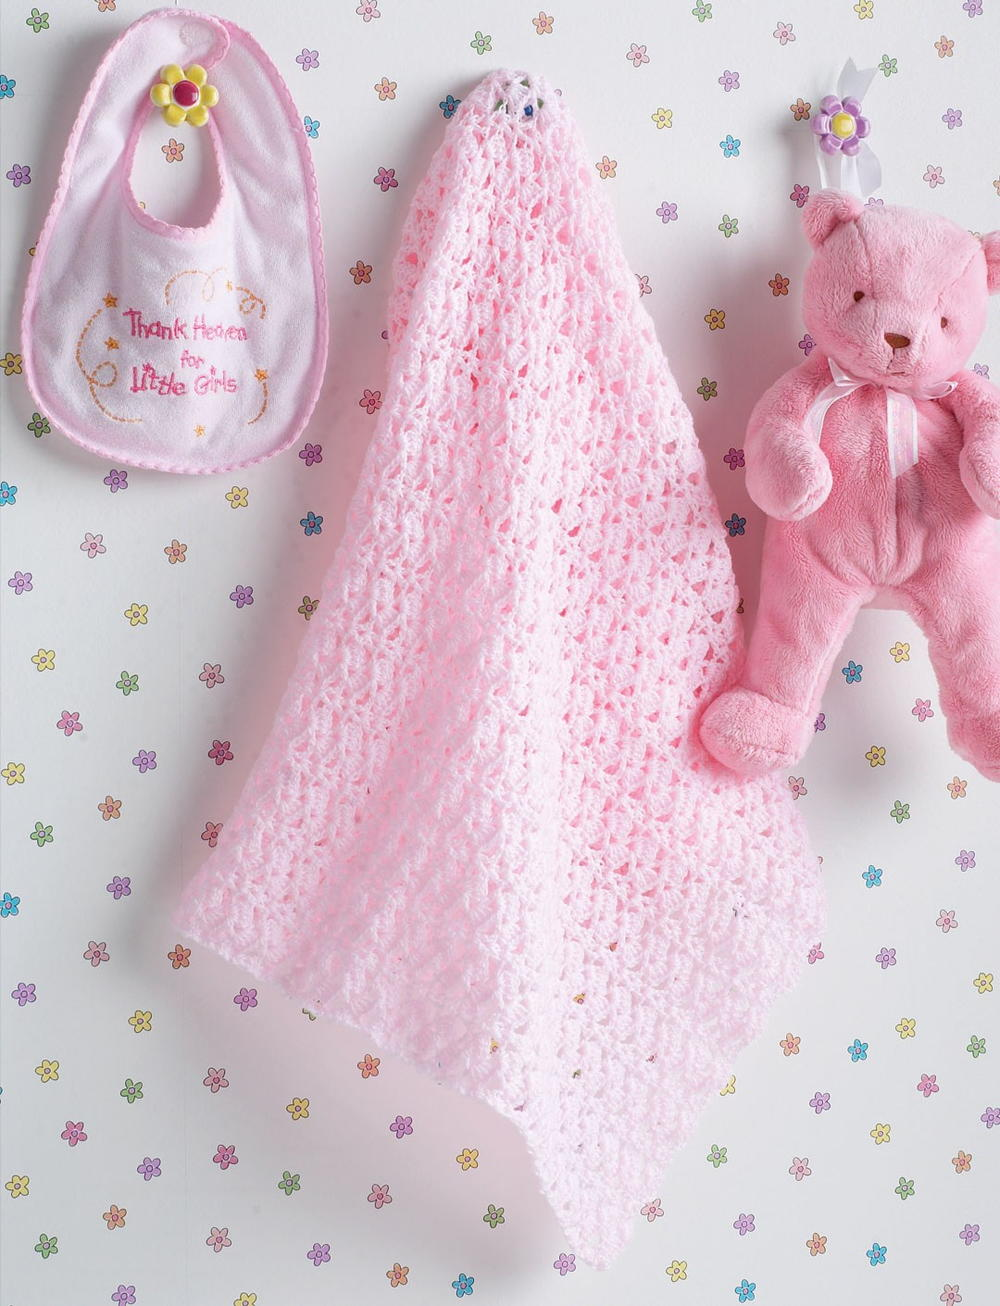 Beautiful Crochet Baby Blanket | FaveCrafts.com